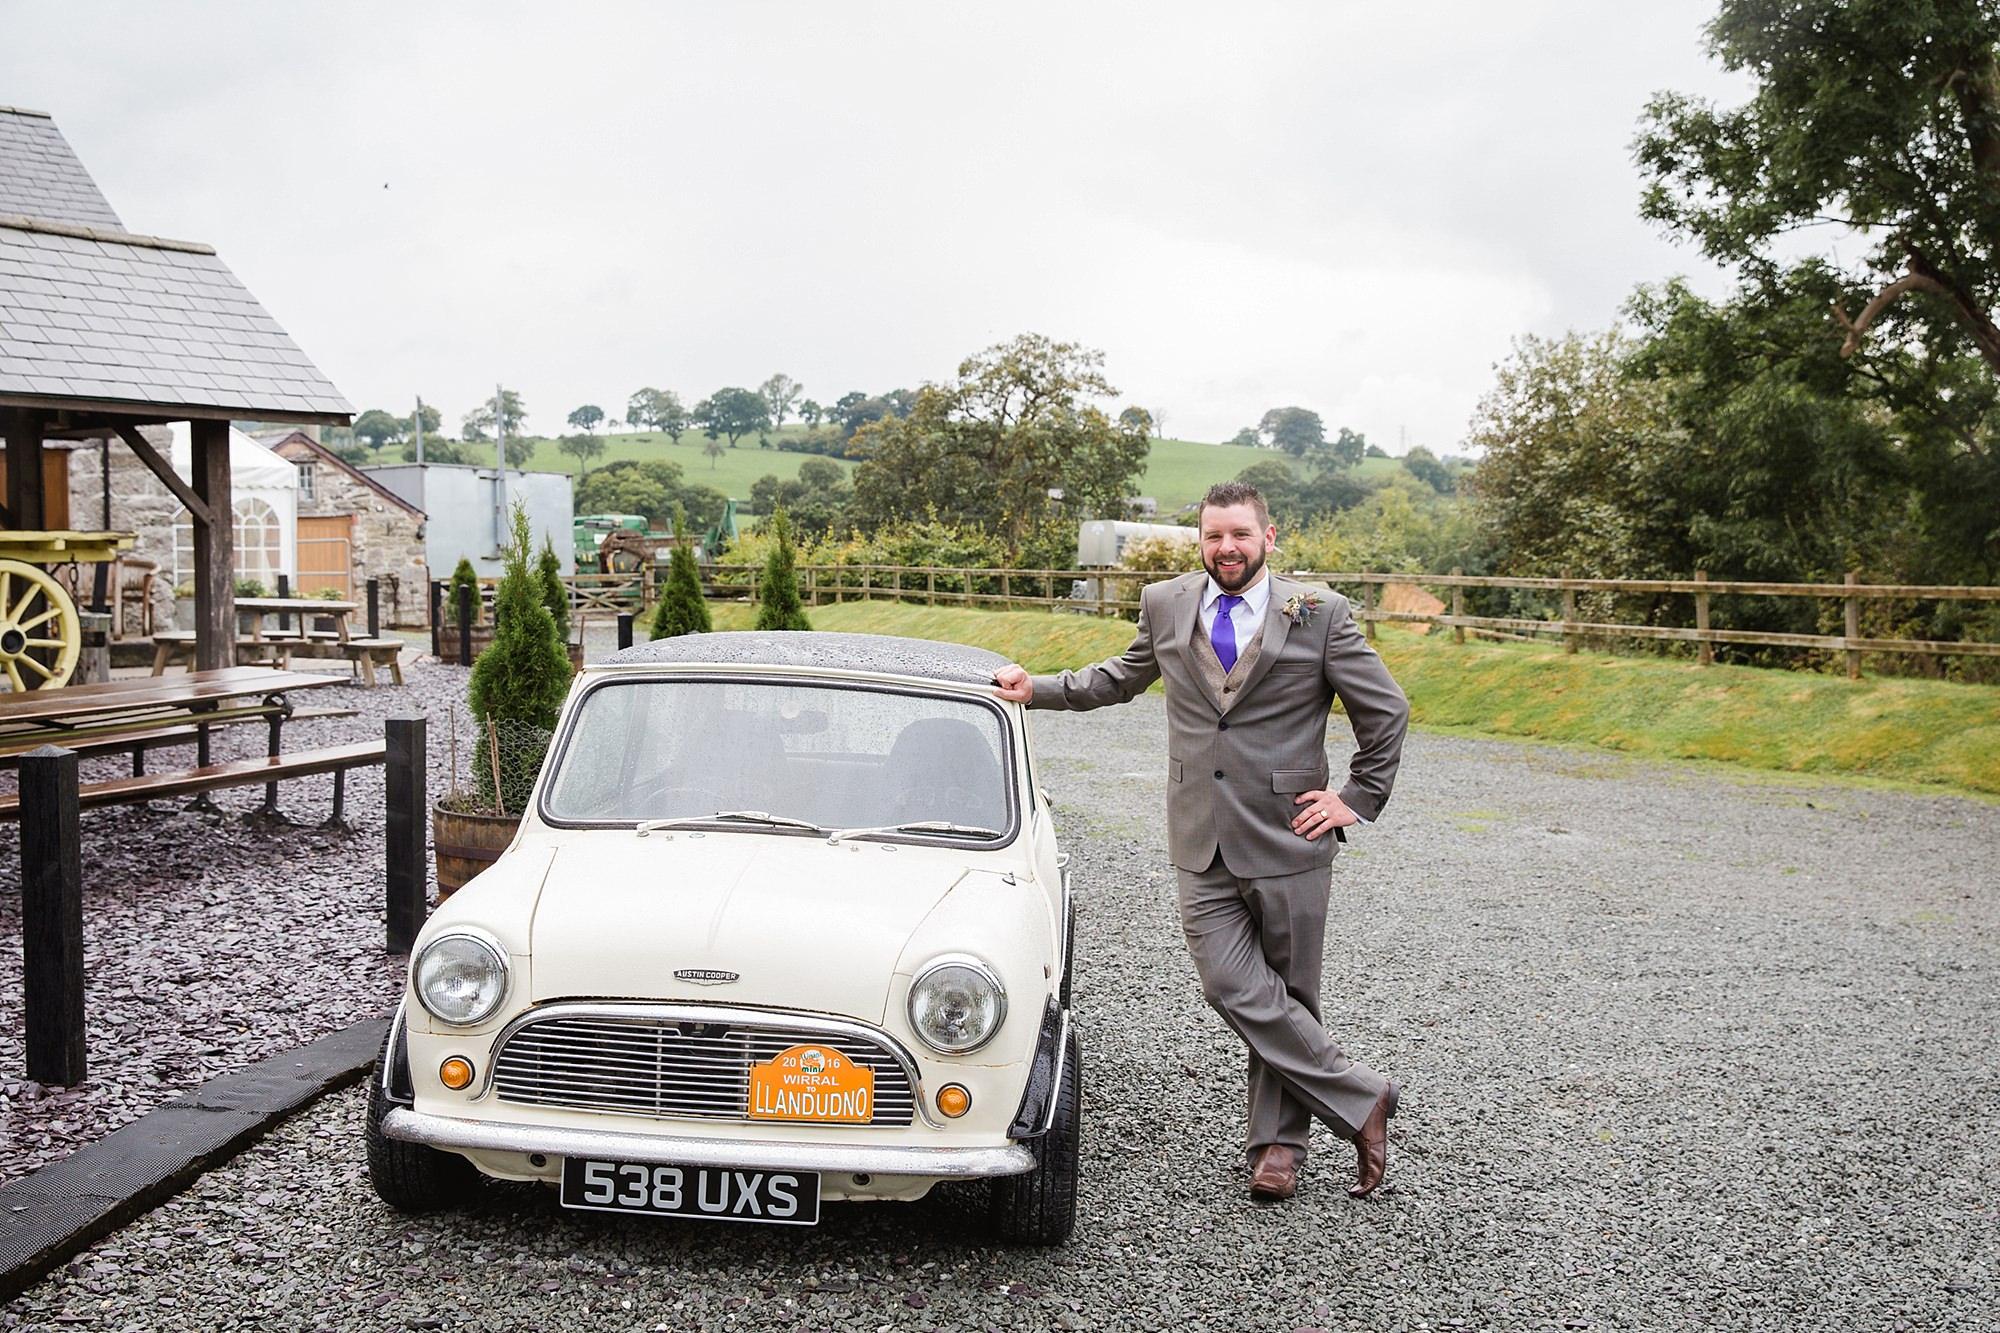 A fun wedding portrait of groom with his mini cooper